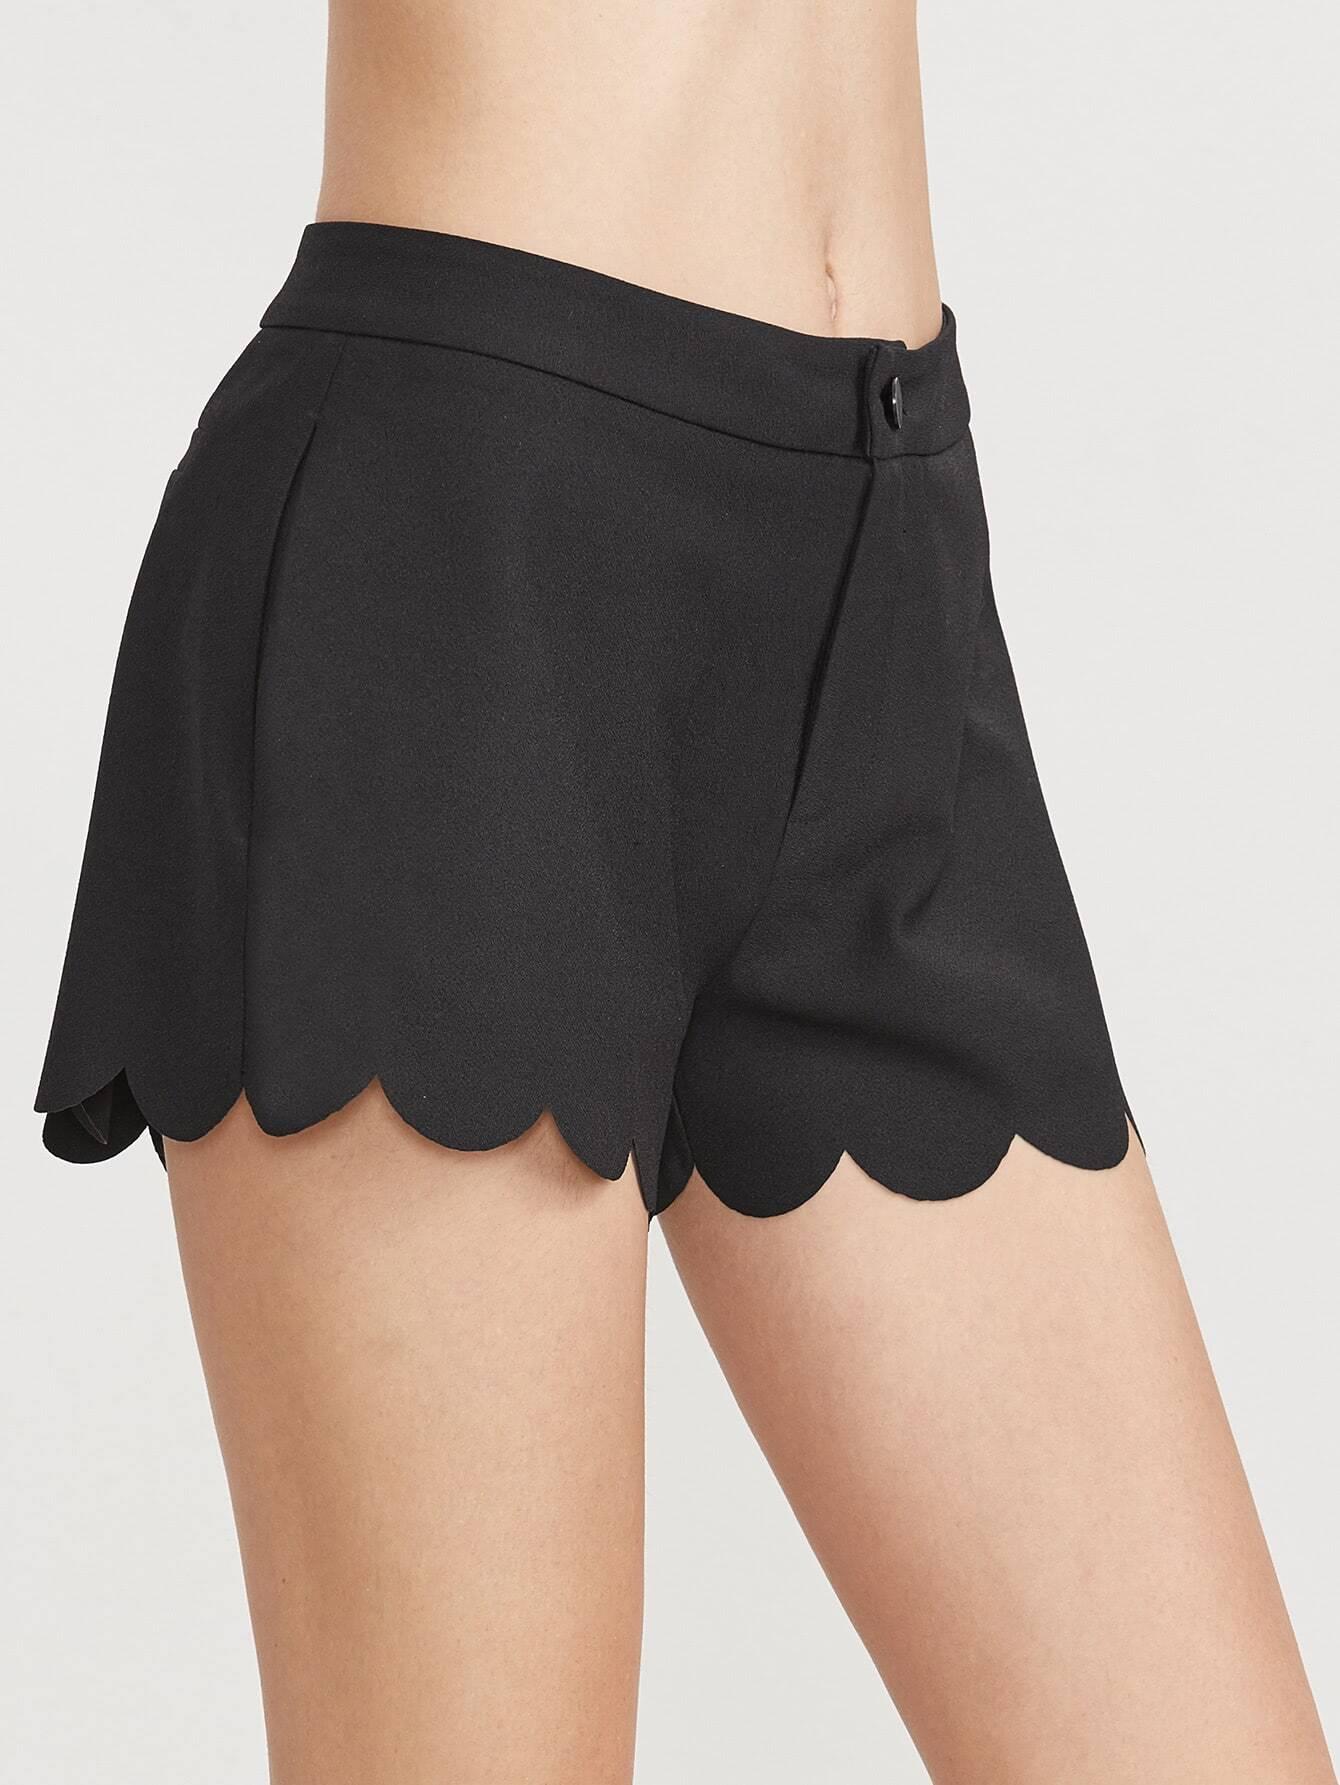 shorts161227702_2